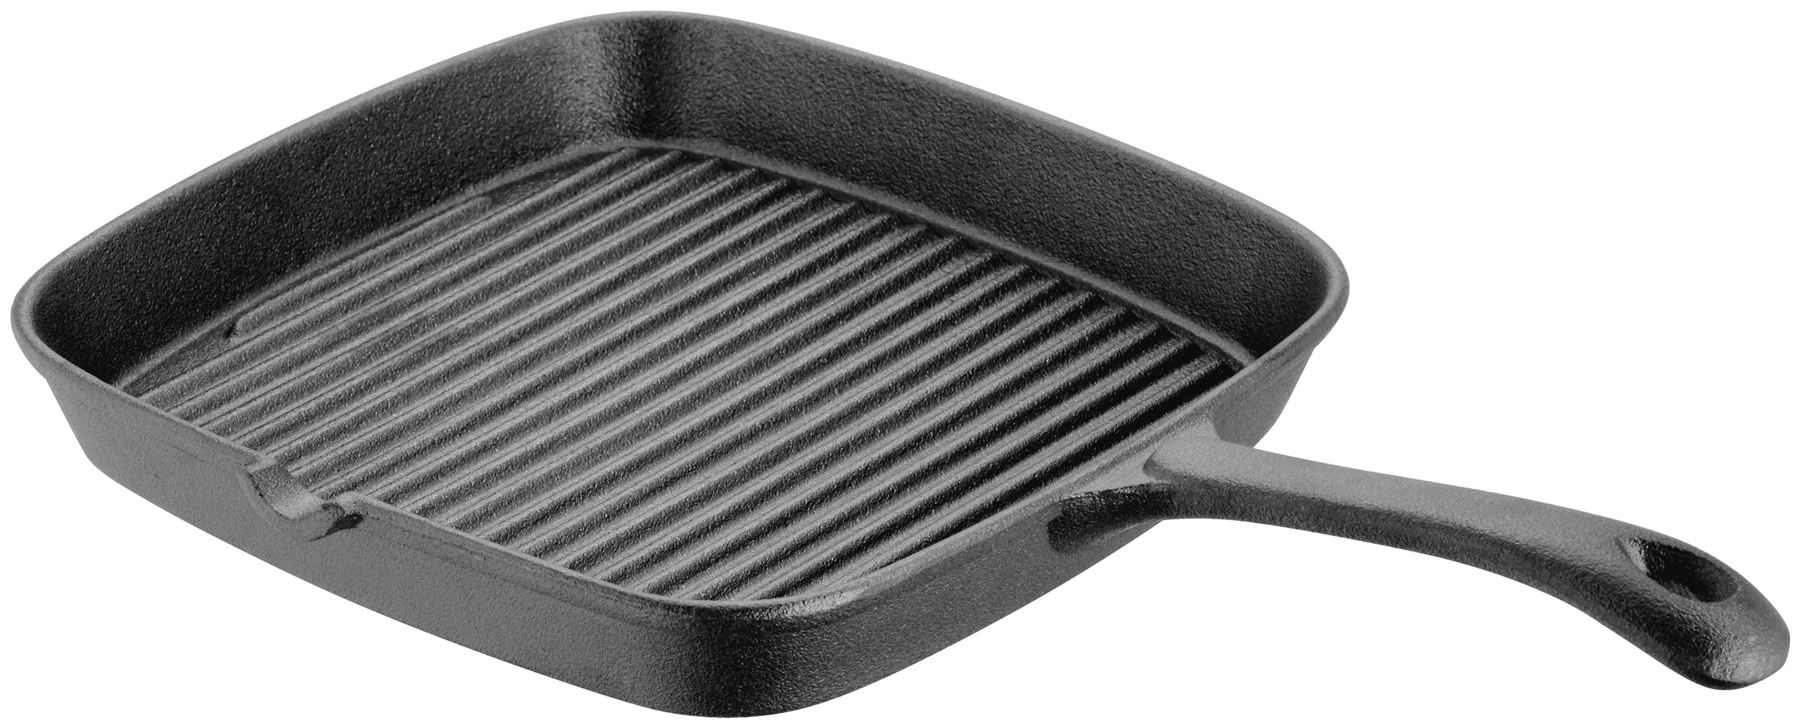 judge cast iron griddle or skillet fry pan various sizes. Black Bedroom Furniture Sets. Home Design Ideas